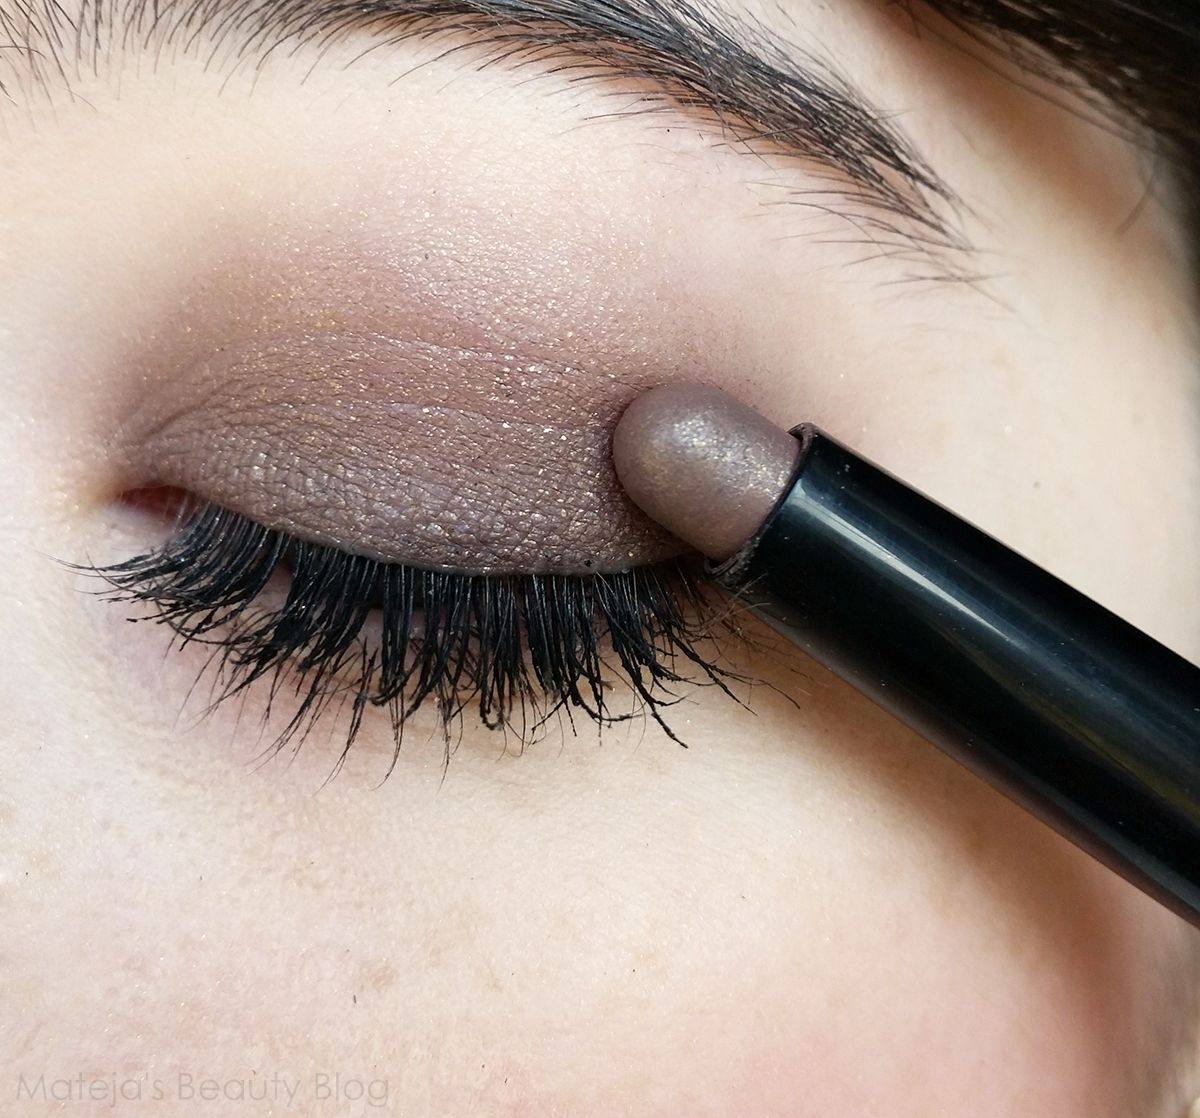 Matejas Beauty Blog Kiko Long Lasting Stick Eyeshadow 38 Golden